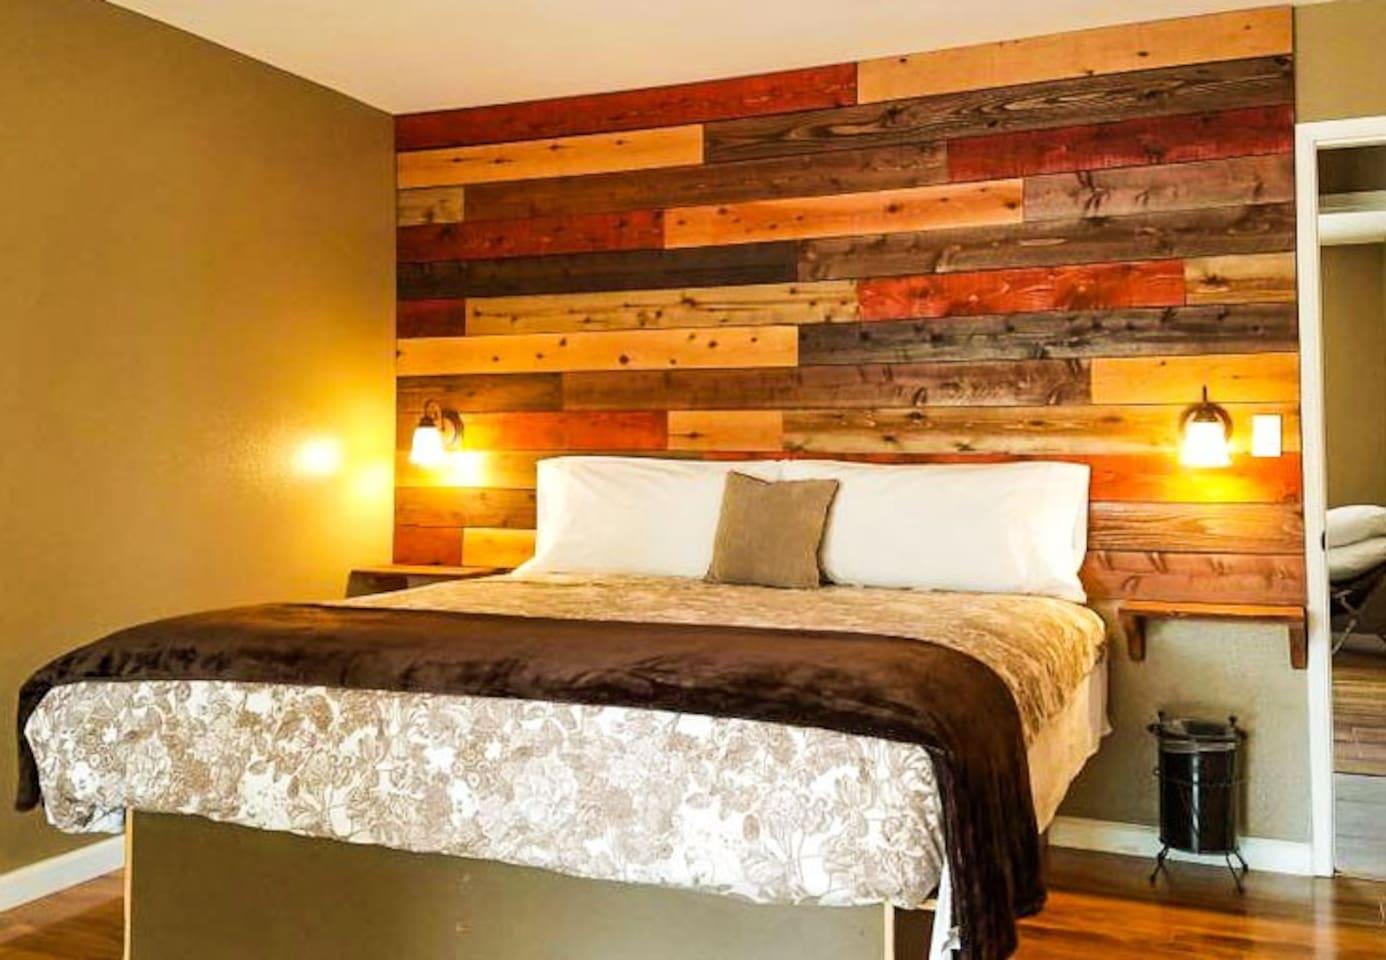 Master bedroom with comfortable amenities.